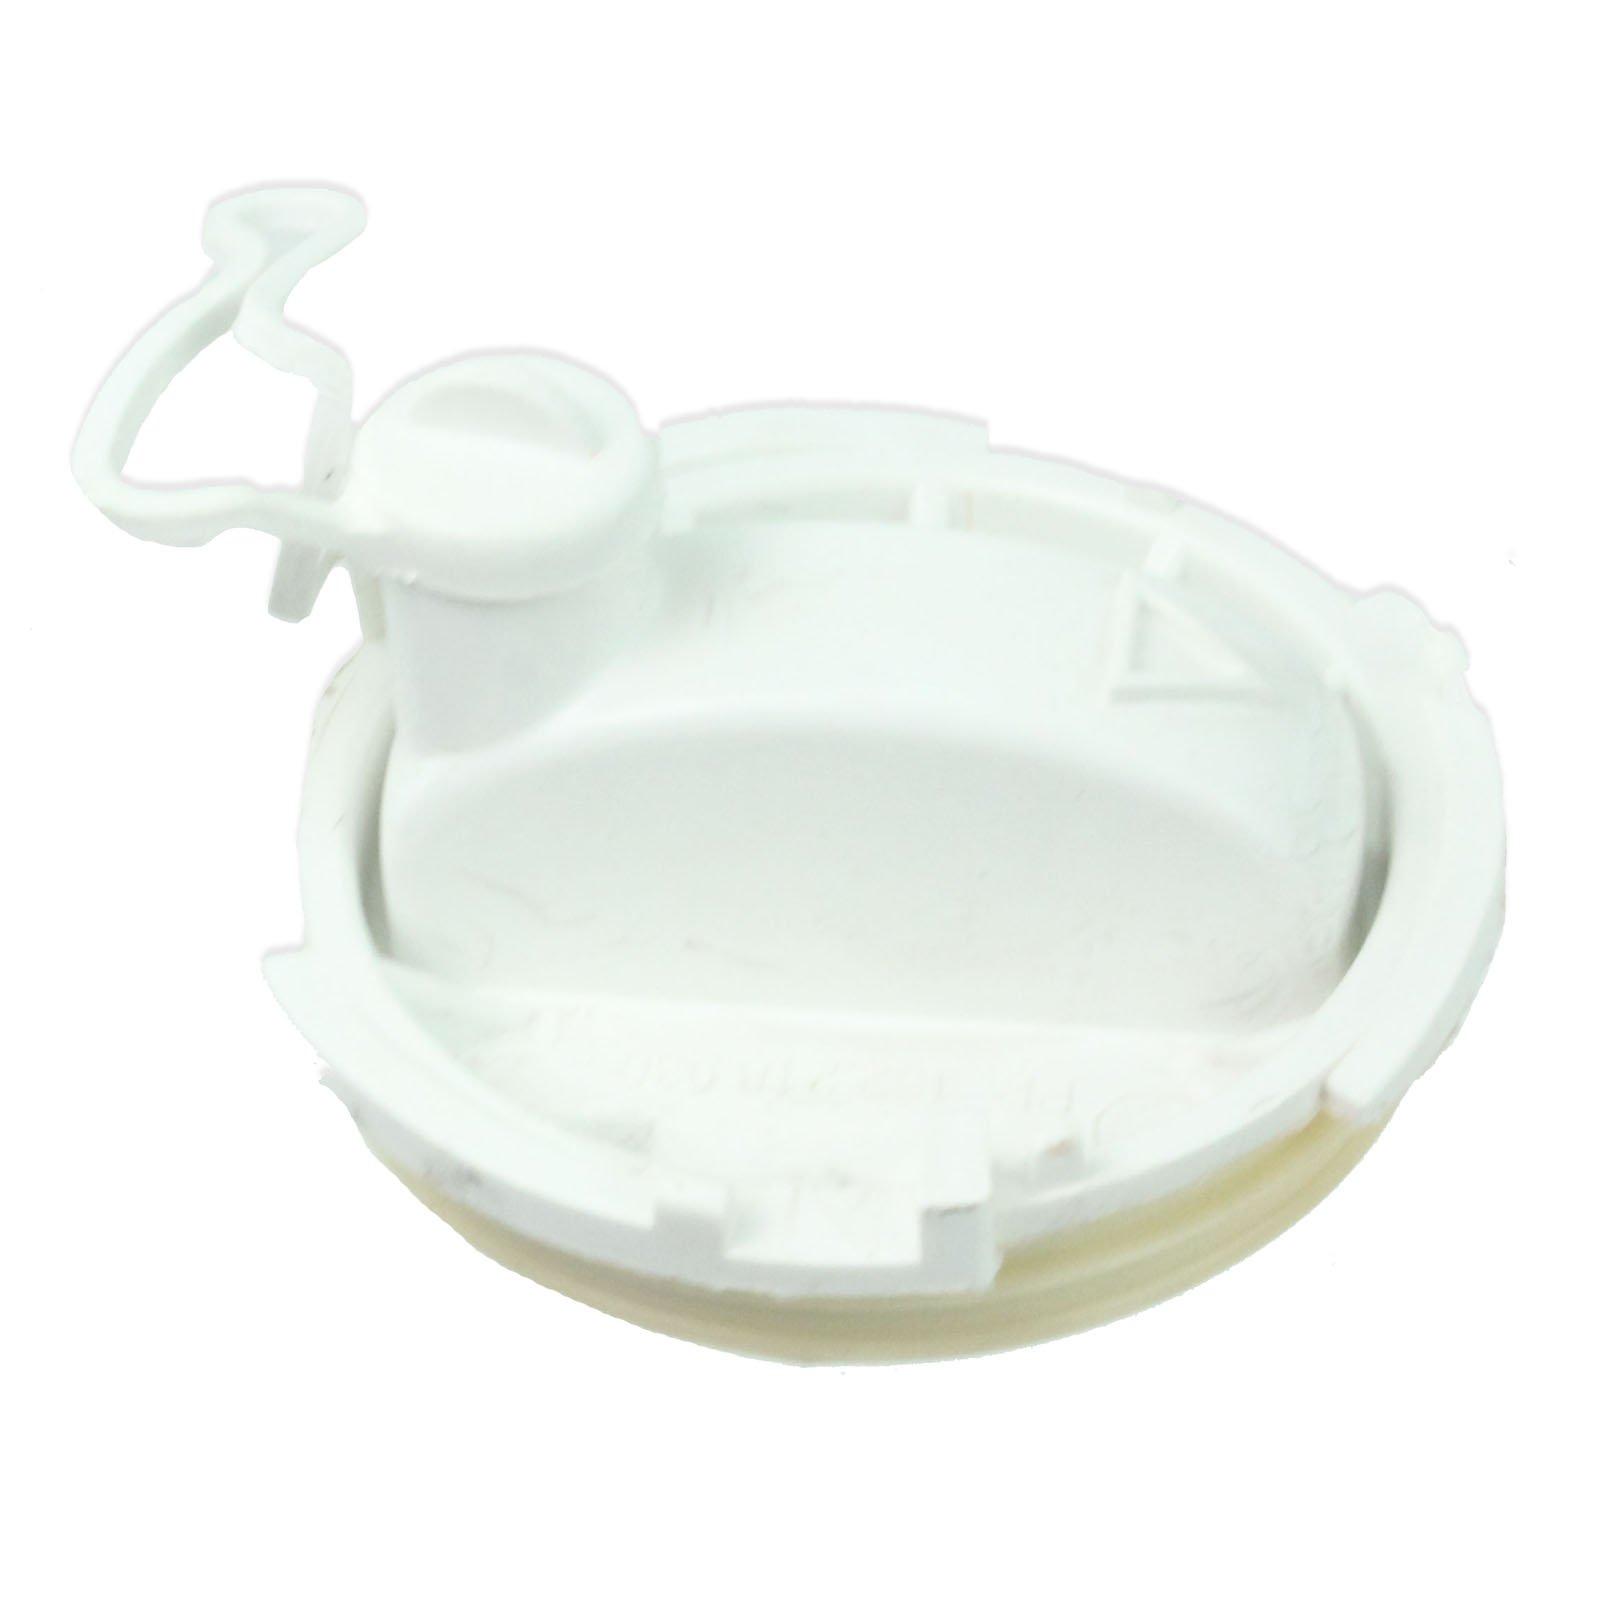 Electrolux Washing Machine Filter Filter Cap: Amazon.de: Küche